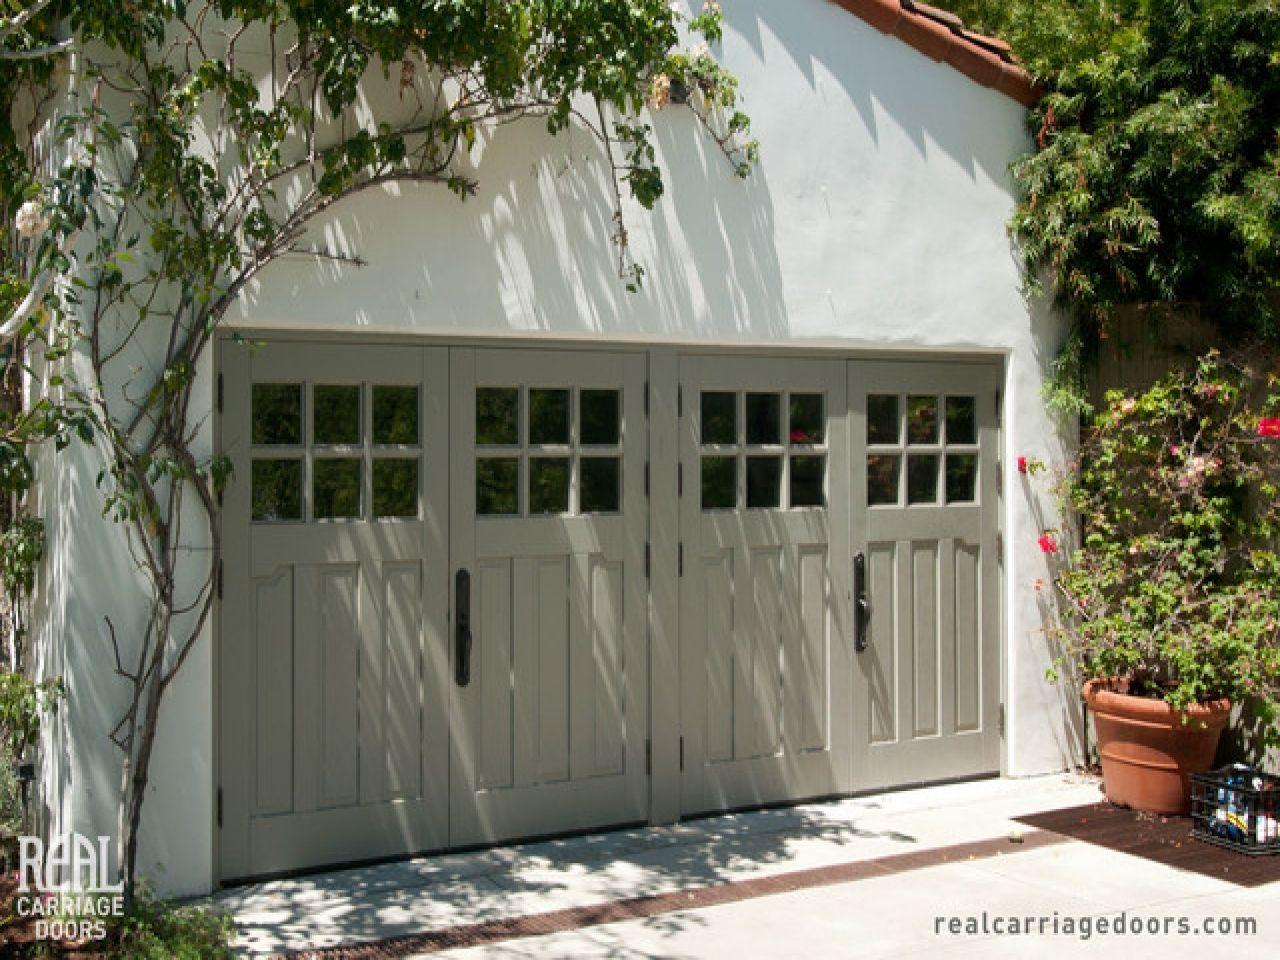 Craftsman Style Garage Garage Door Panels Double Carriage Garage